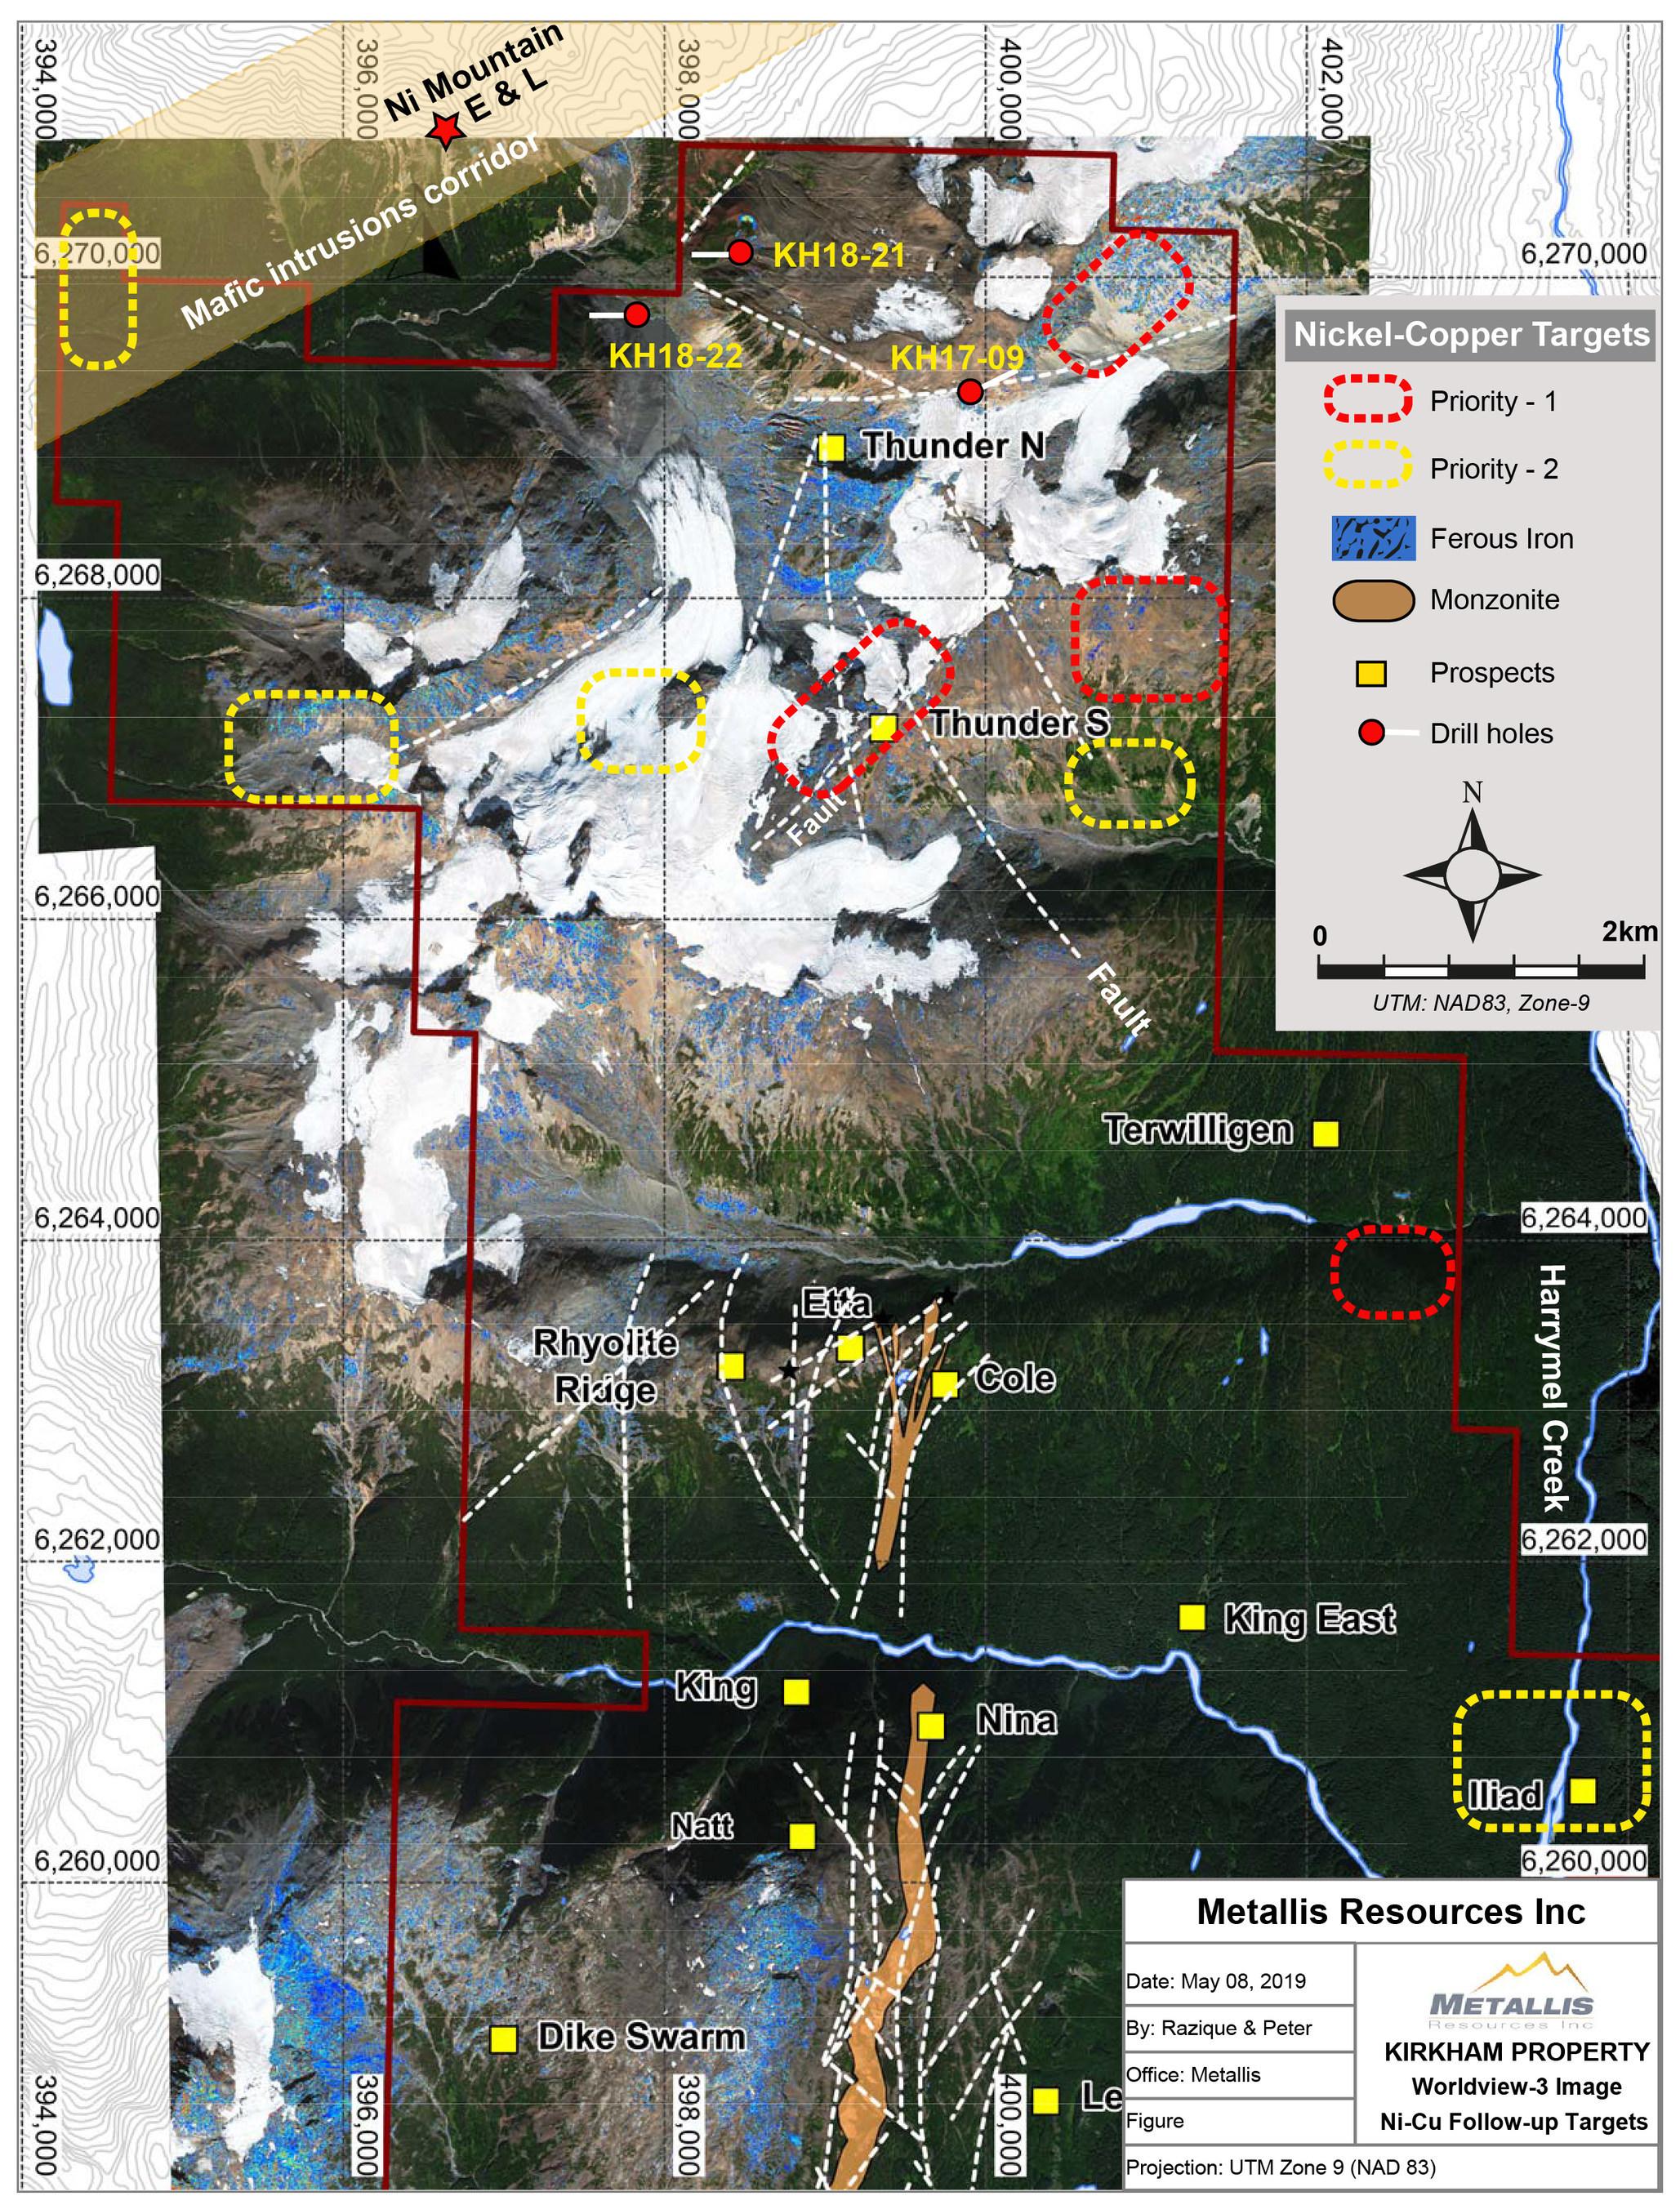 Metallis Resources Inc - Kirkham Property - Worldview-3 Image - Ni-Cu Followup Target Map (CNW Group/Metallis Resources Inc.)